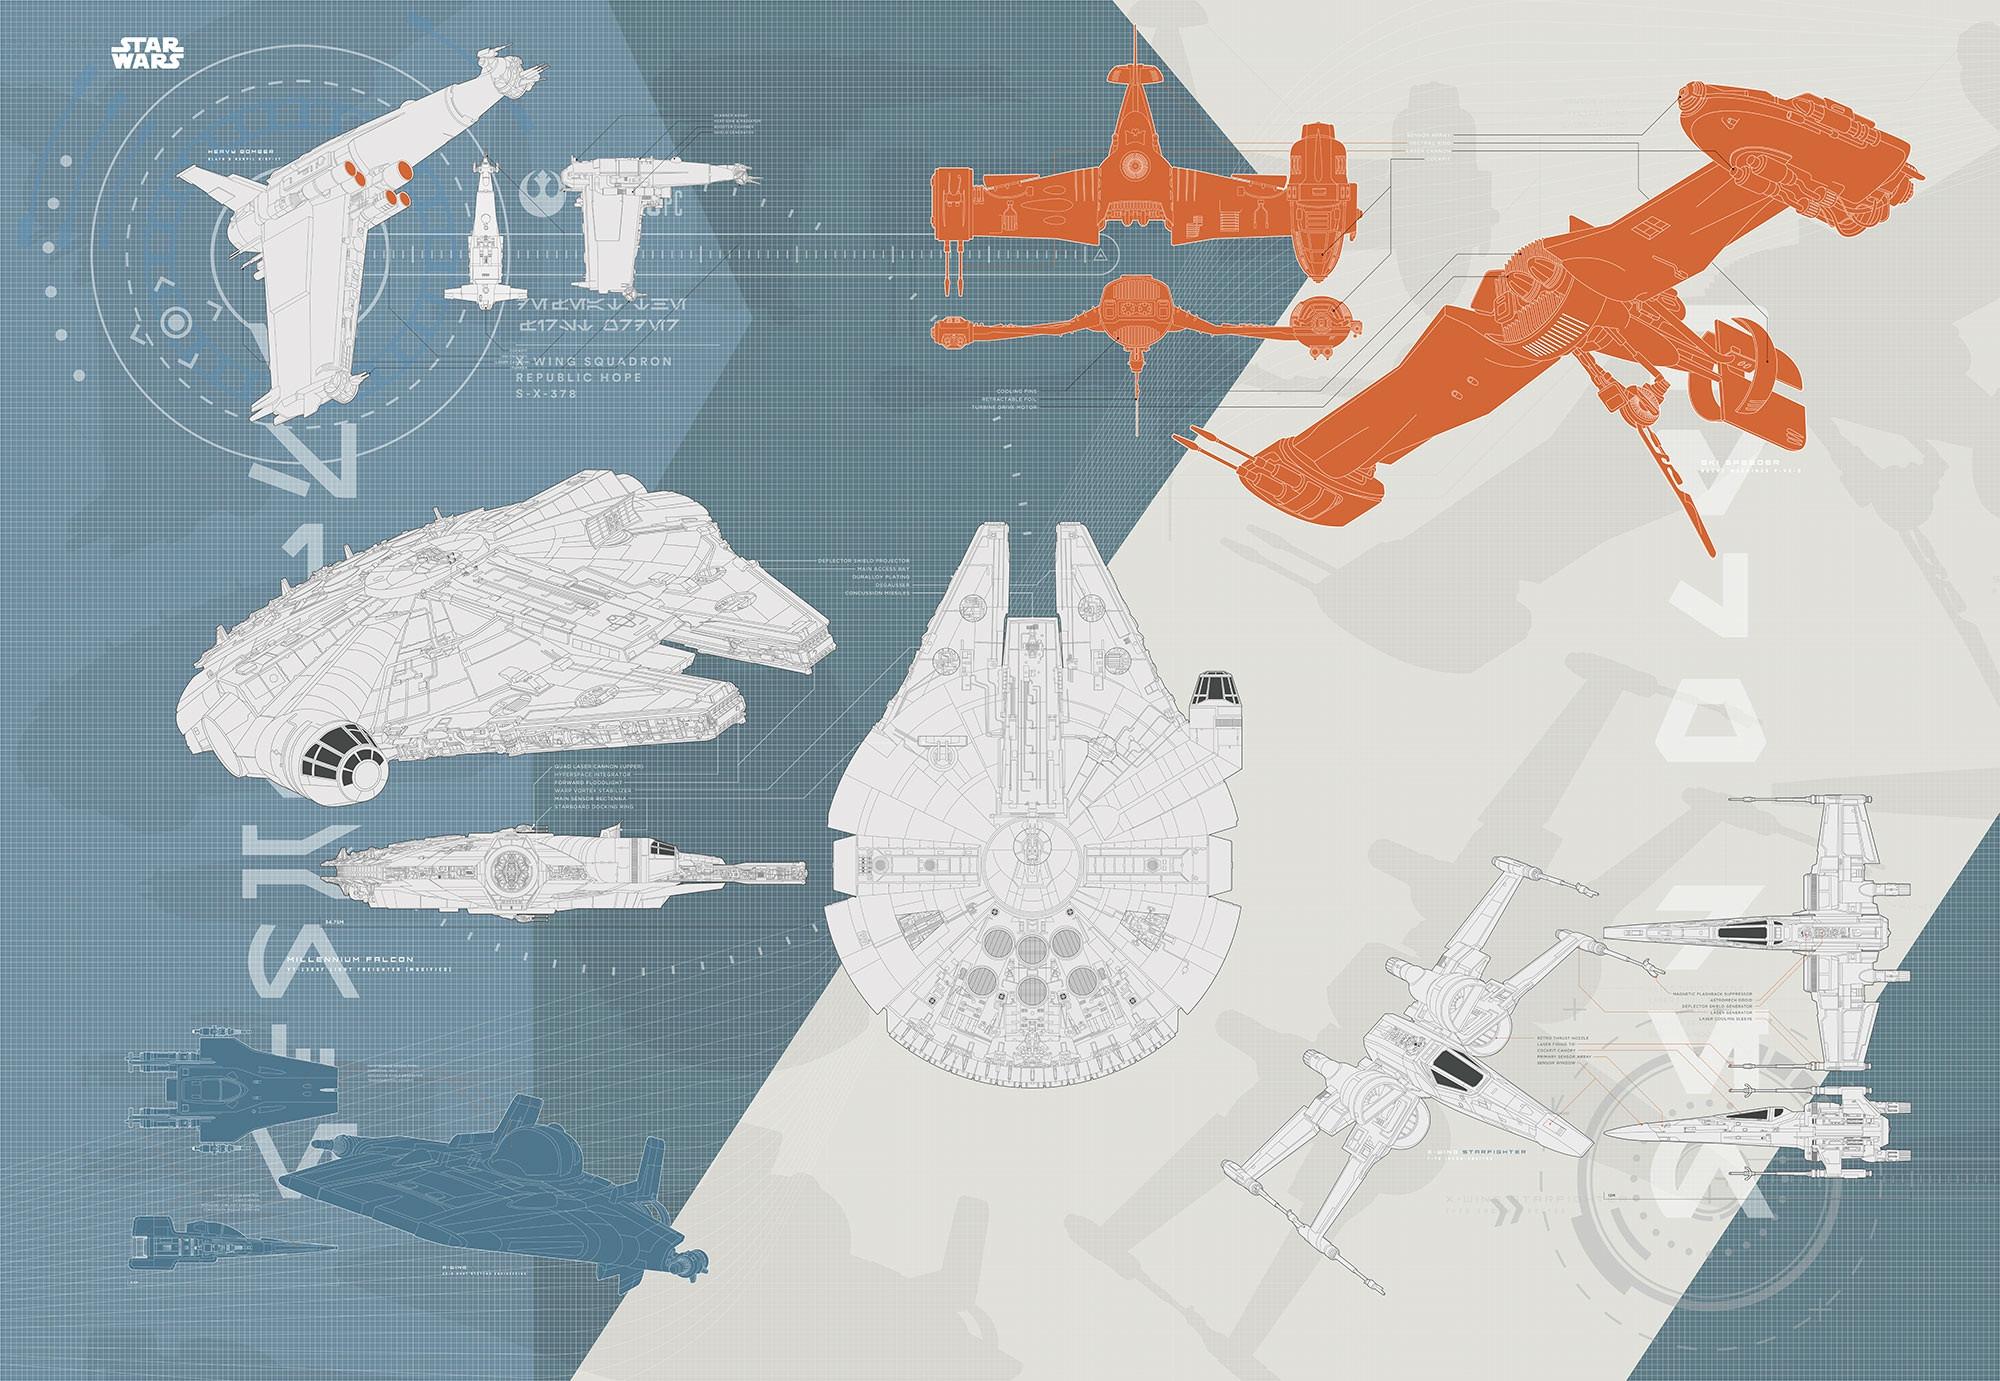 STAR WARS Technical Plan